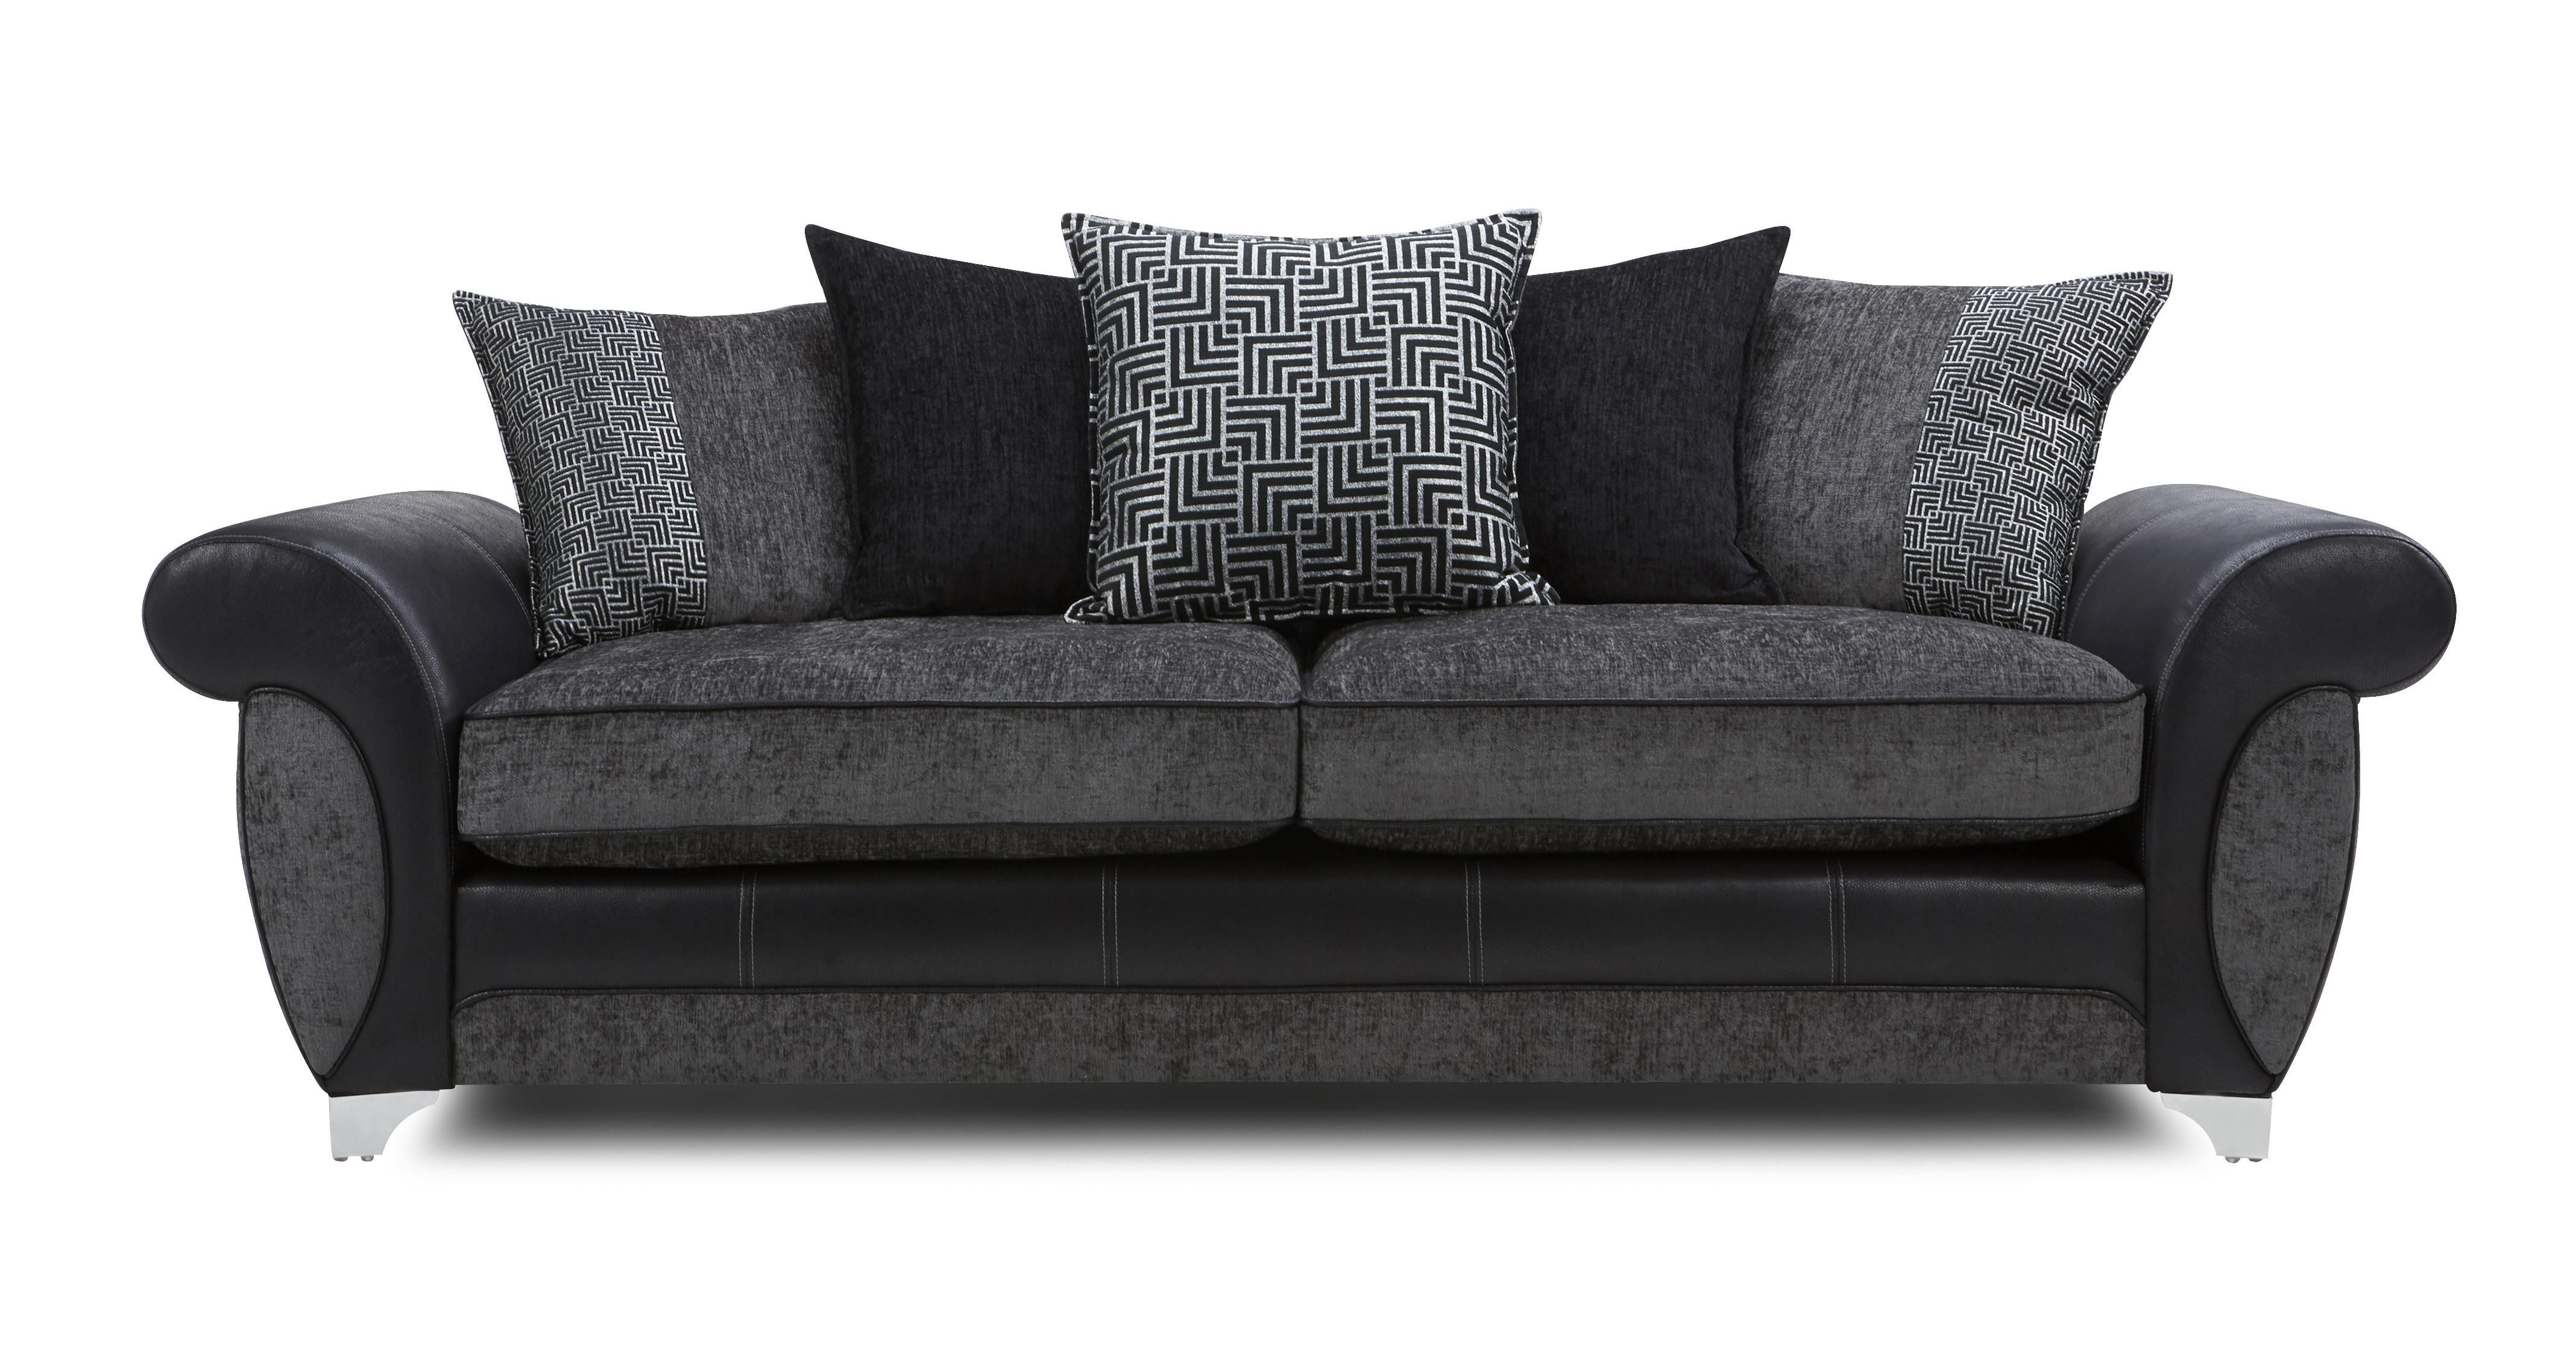 Dfs black sofa Dfs 4 seater leather sofa